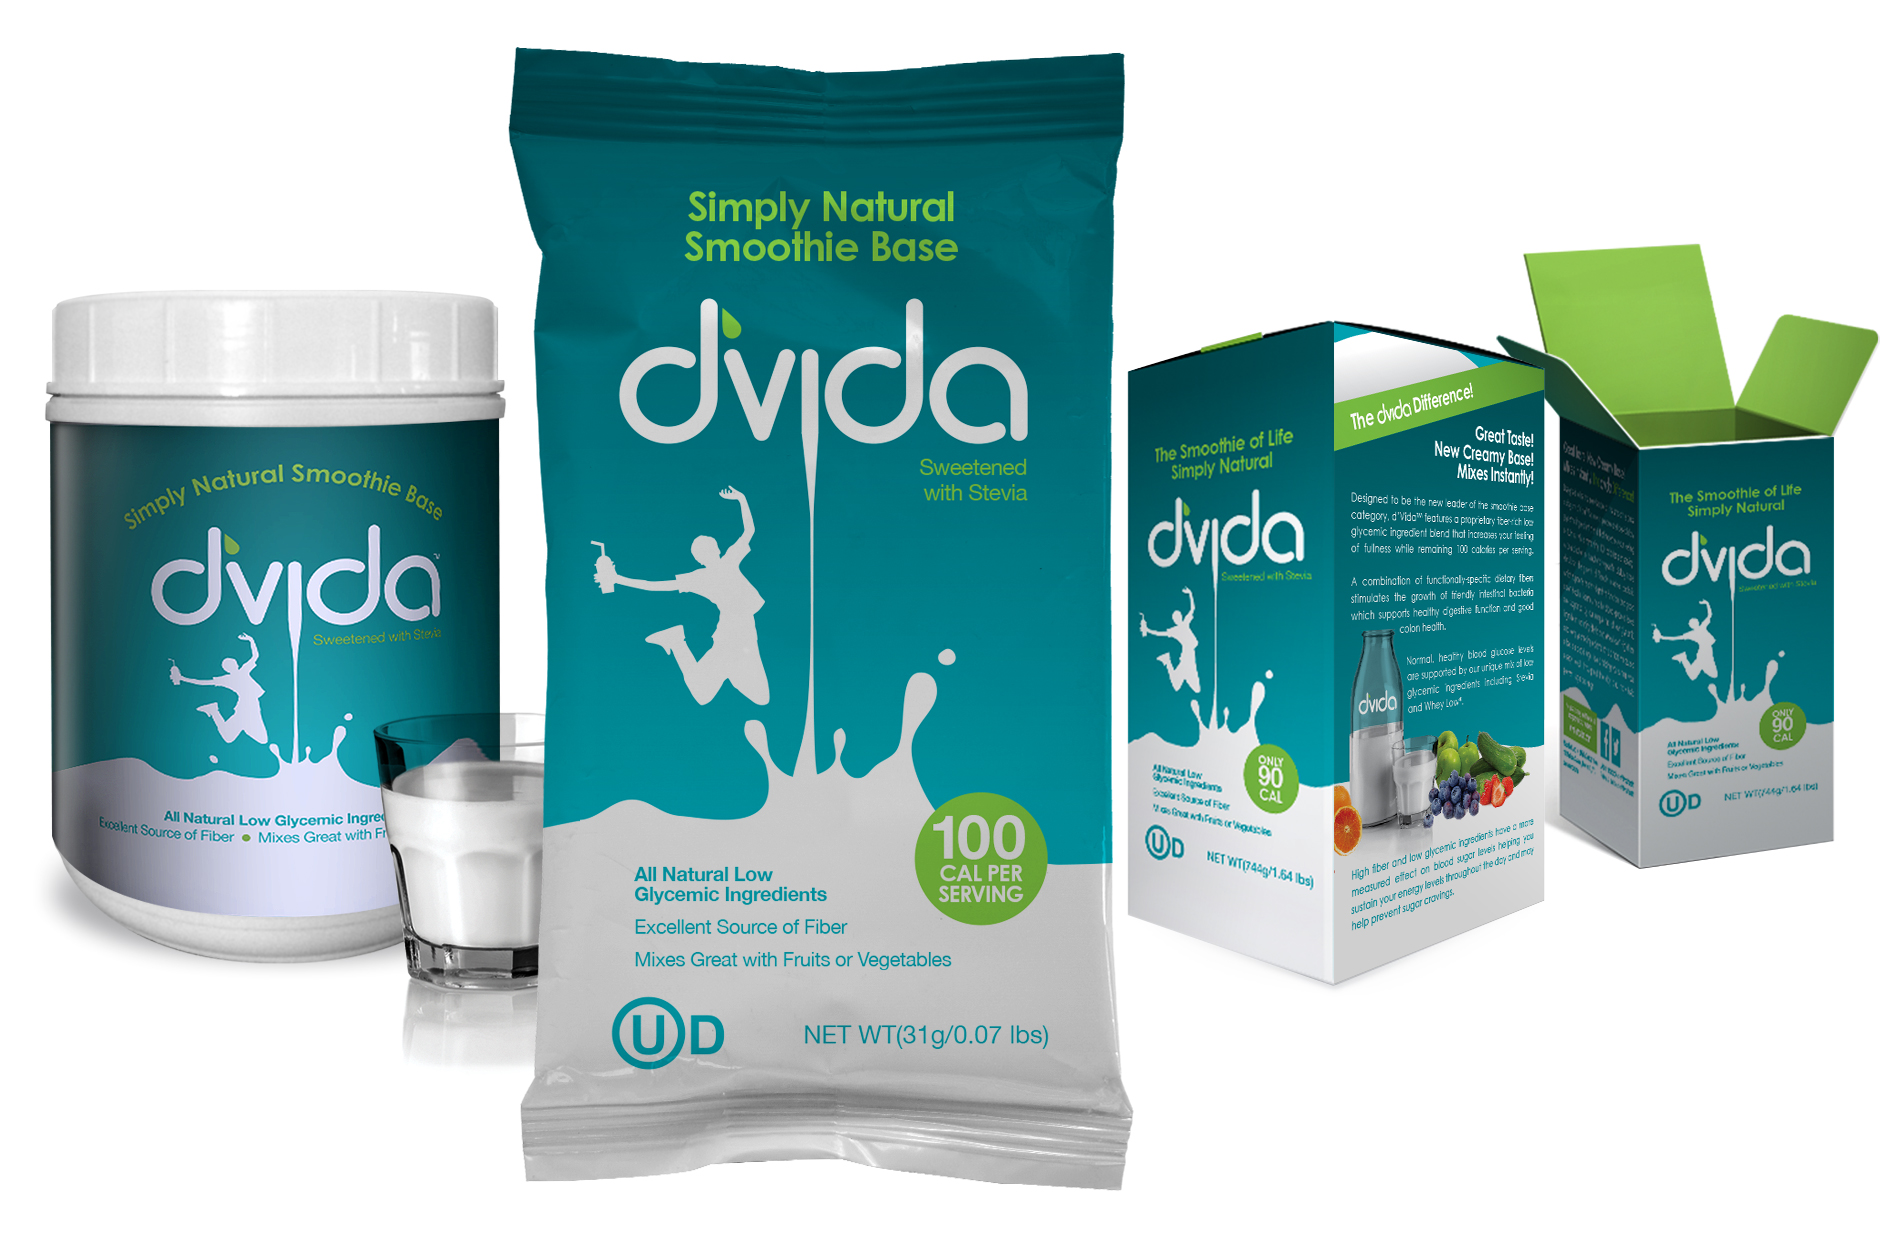 dvida_packaging2_o.jpg